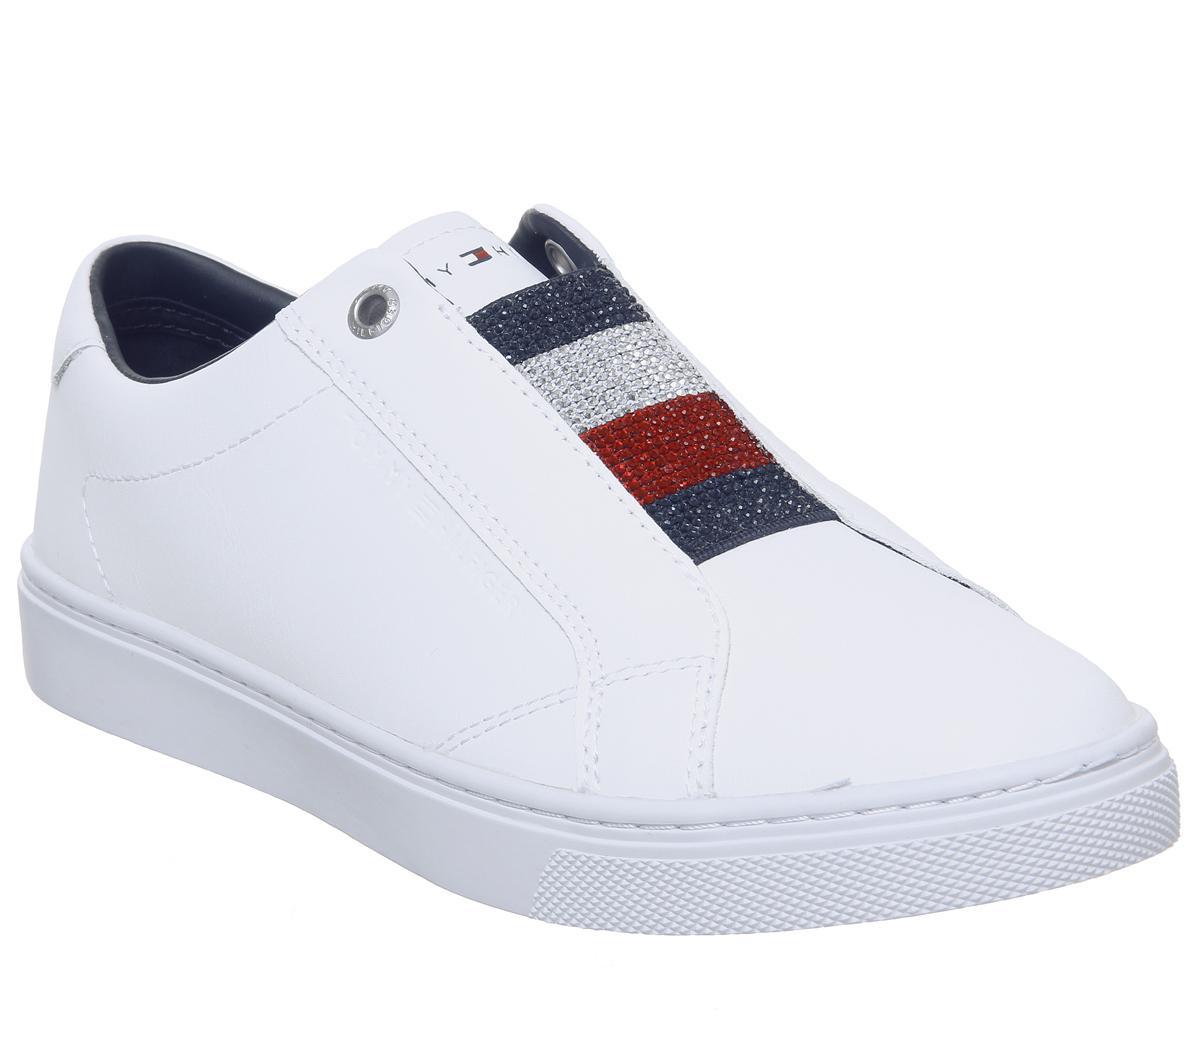 Tommy Hilfiger Slip On Sneakers Crystal